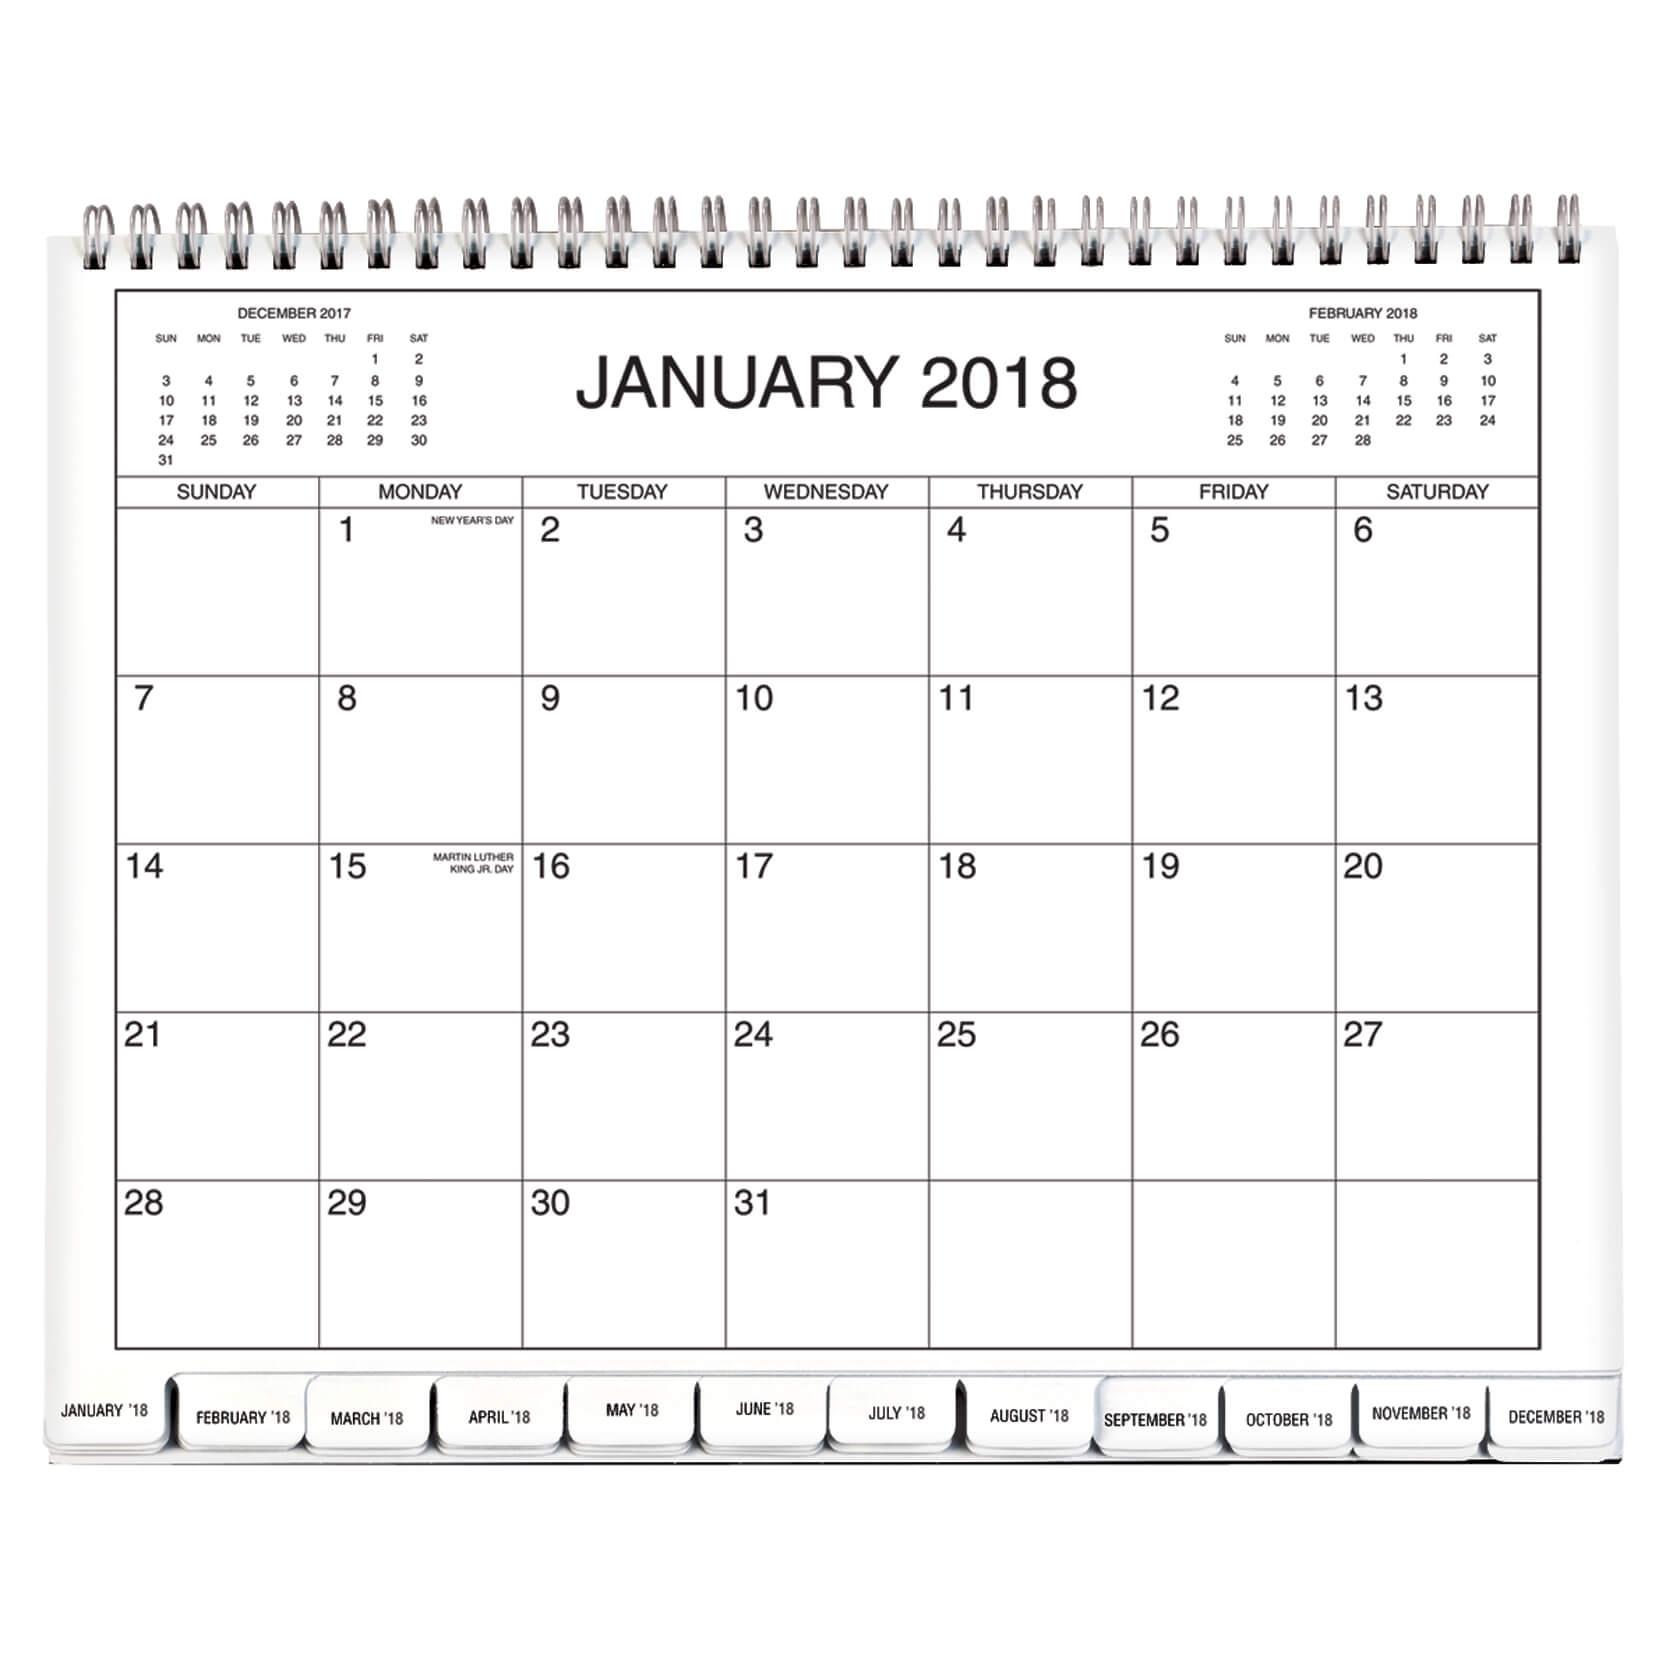 5 Year Calendar 2020 To 2023 | Month Calendar Printable